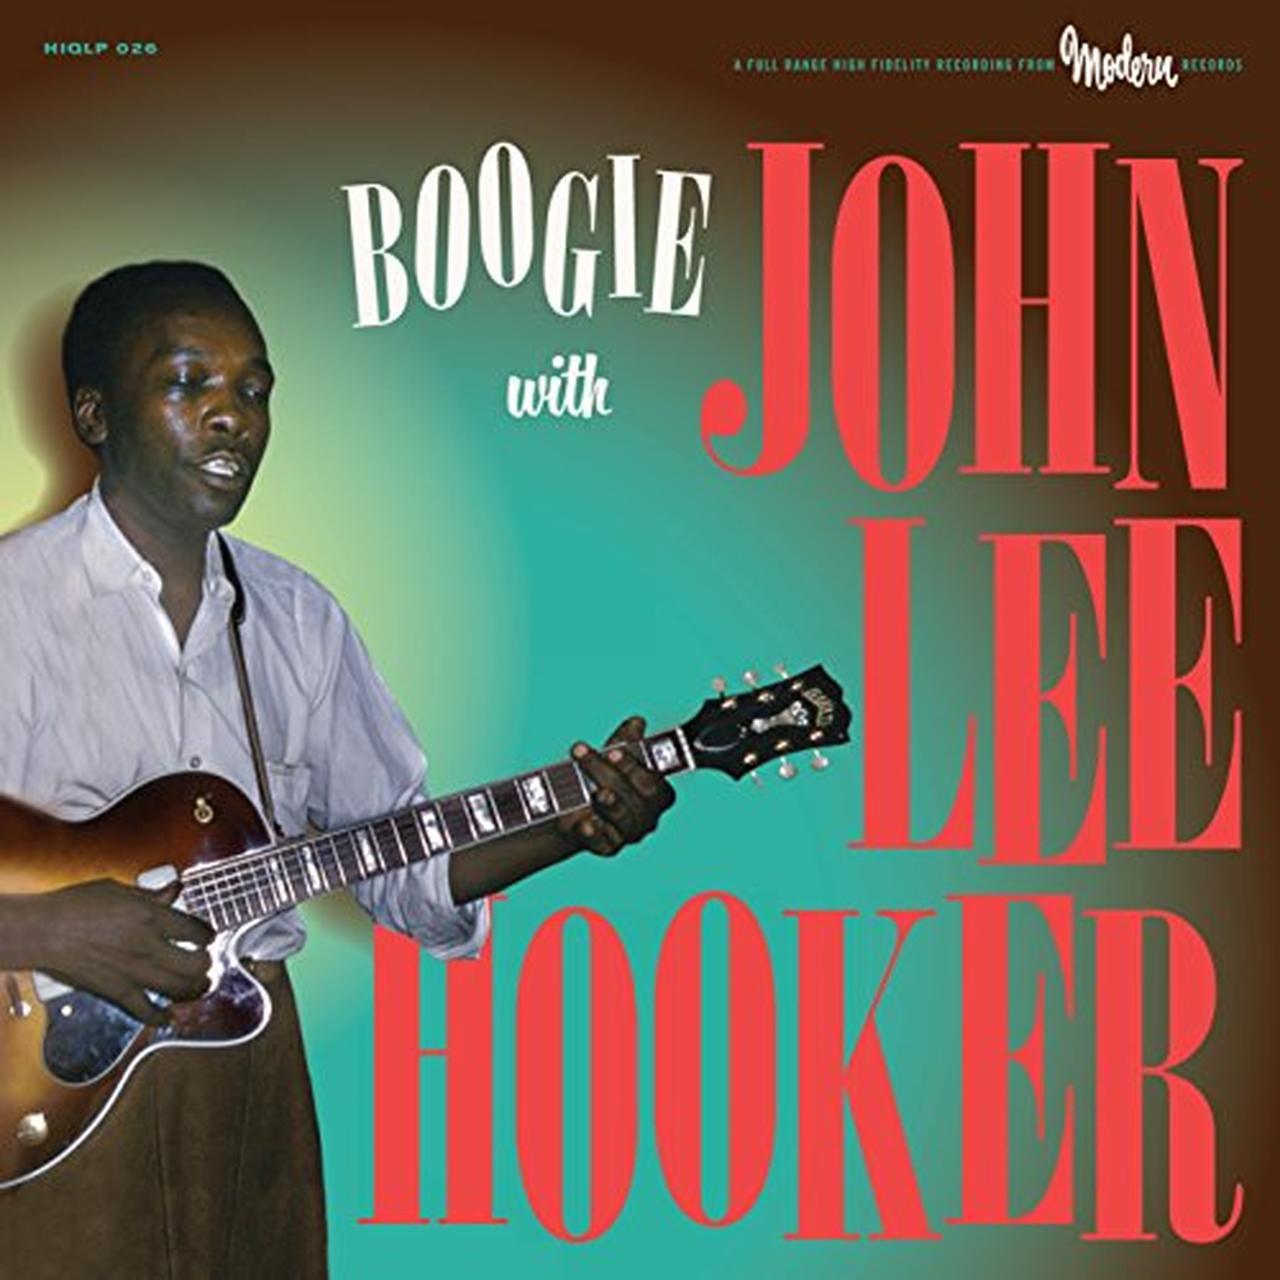 цена на Джон Ли Хукер John Lee Hooker. Boogie With John Lee Hooker (LP)